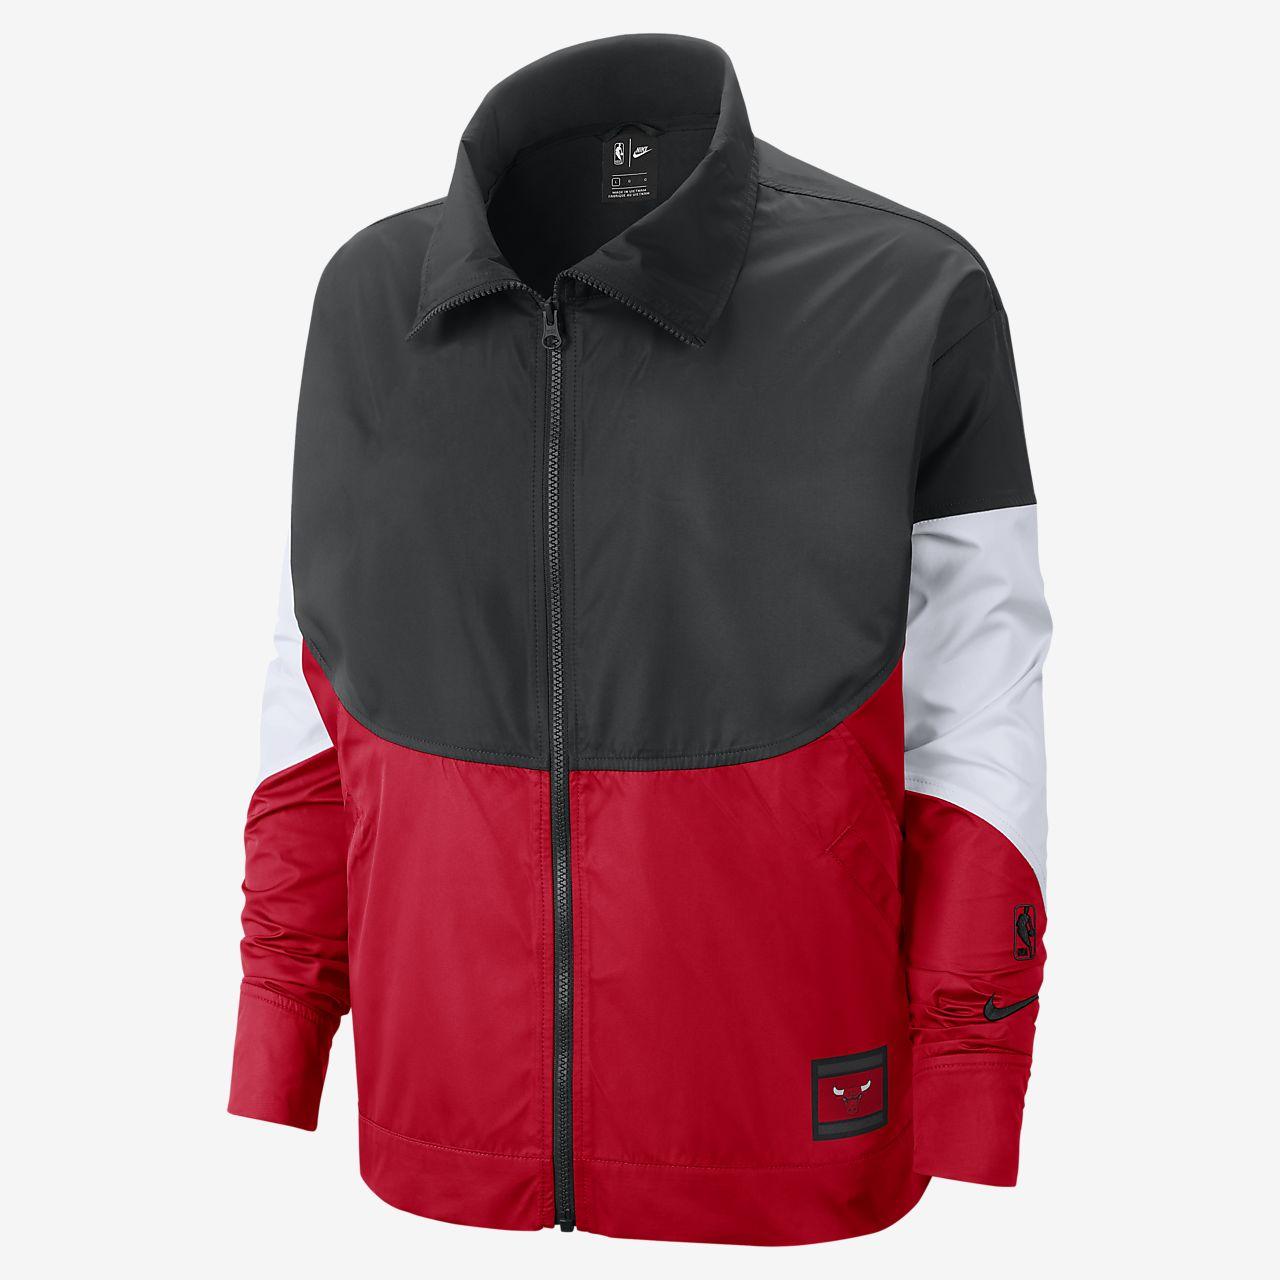 Chicago Bulls Nike Women's NBA Jacket